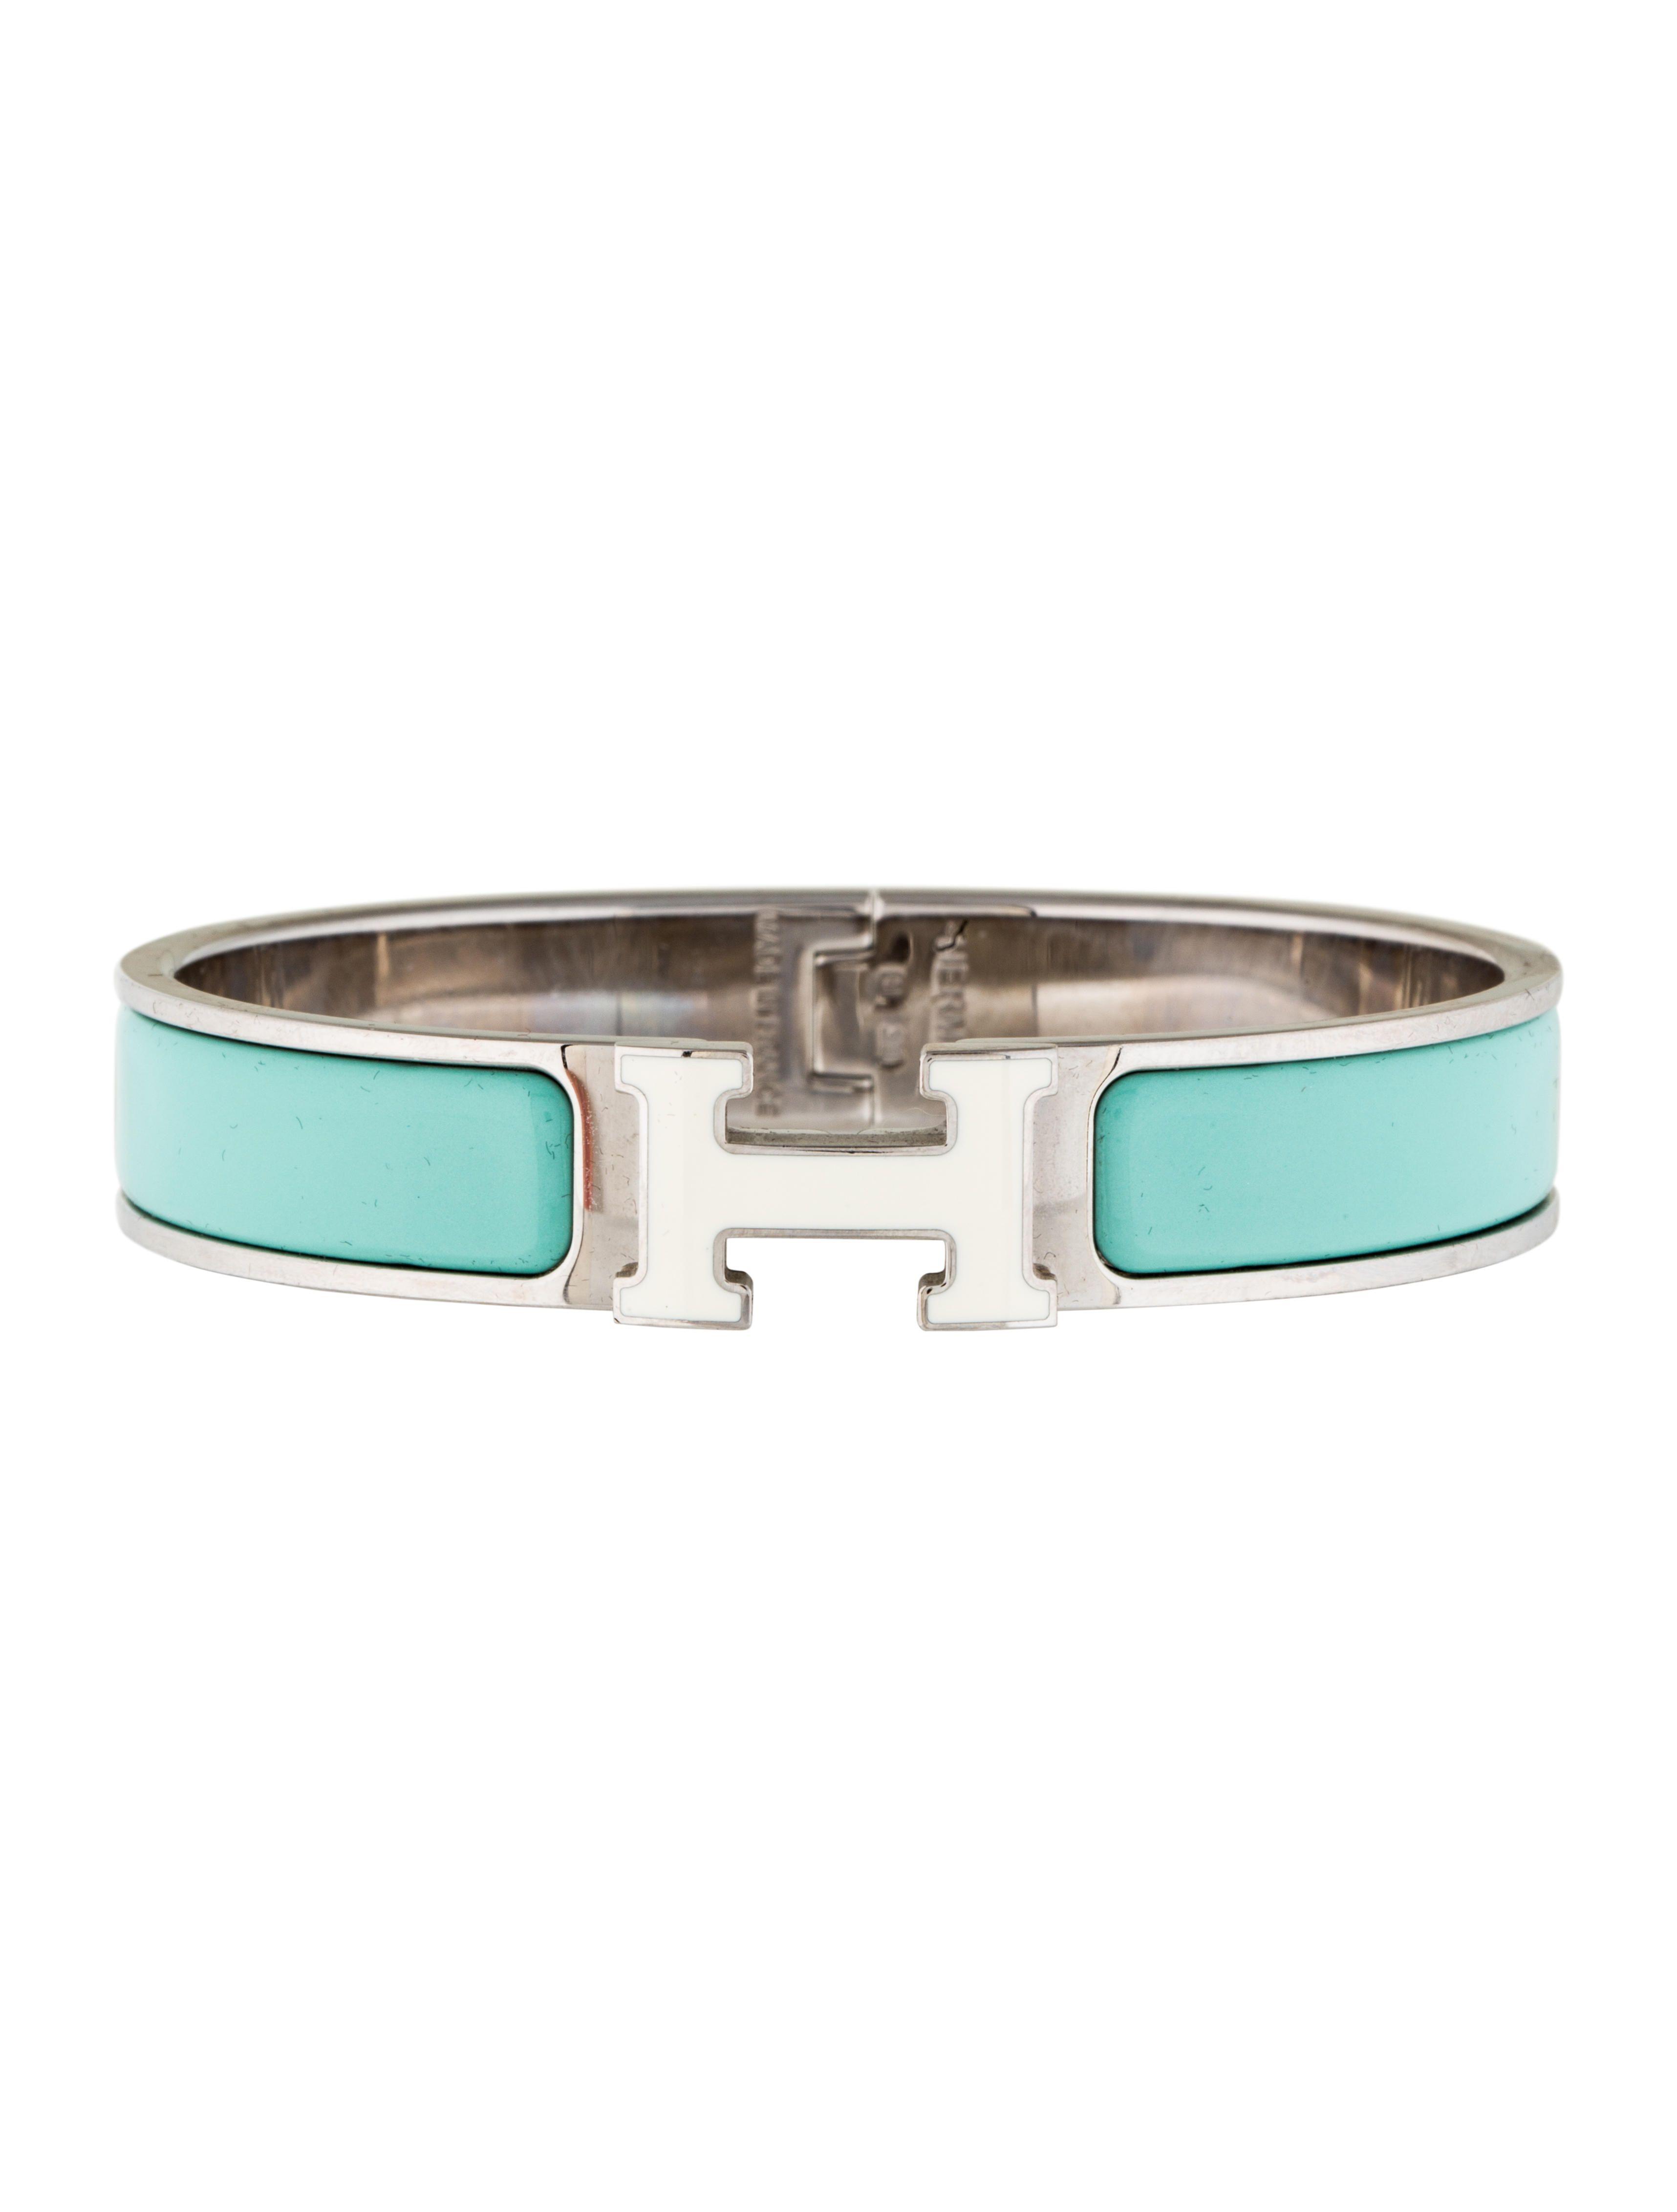 Narrow Clic Clac Bracelet Bracelets White Enamel Narrow